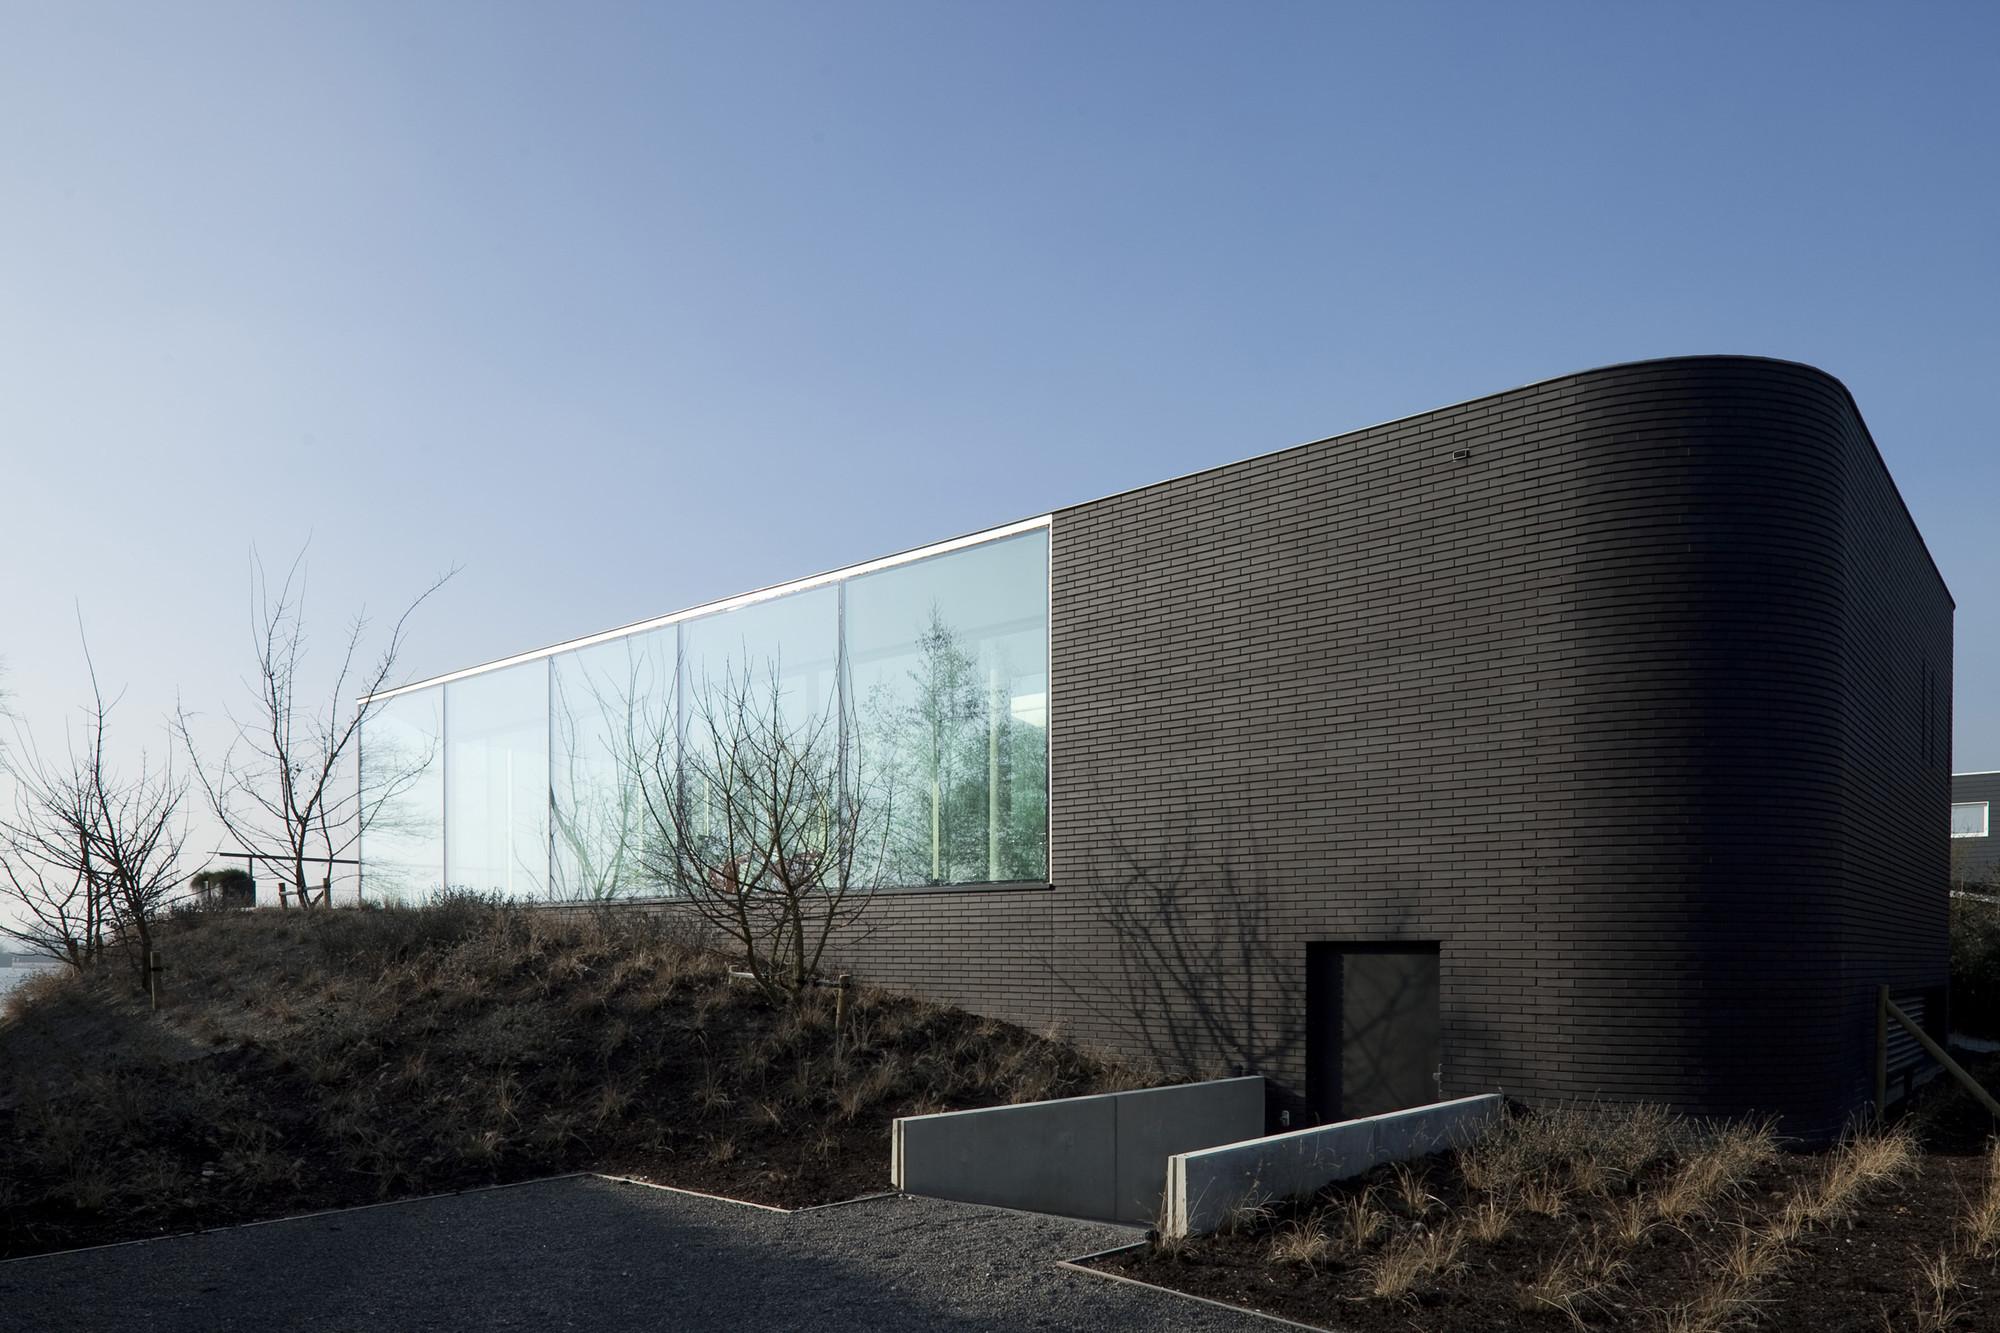 House Kamperland / Bedaux de Brouwer Architecten, © Luuk Kramer